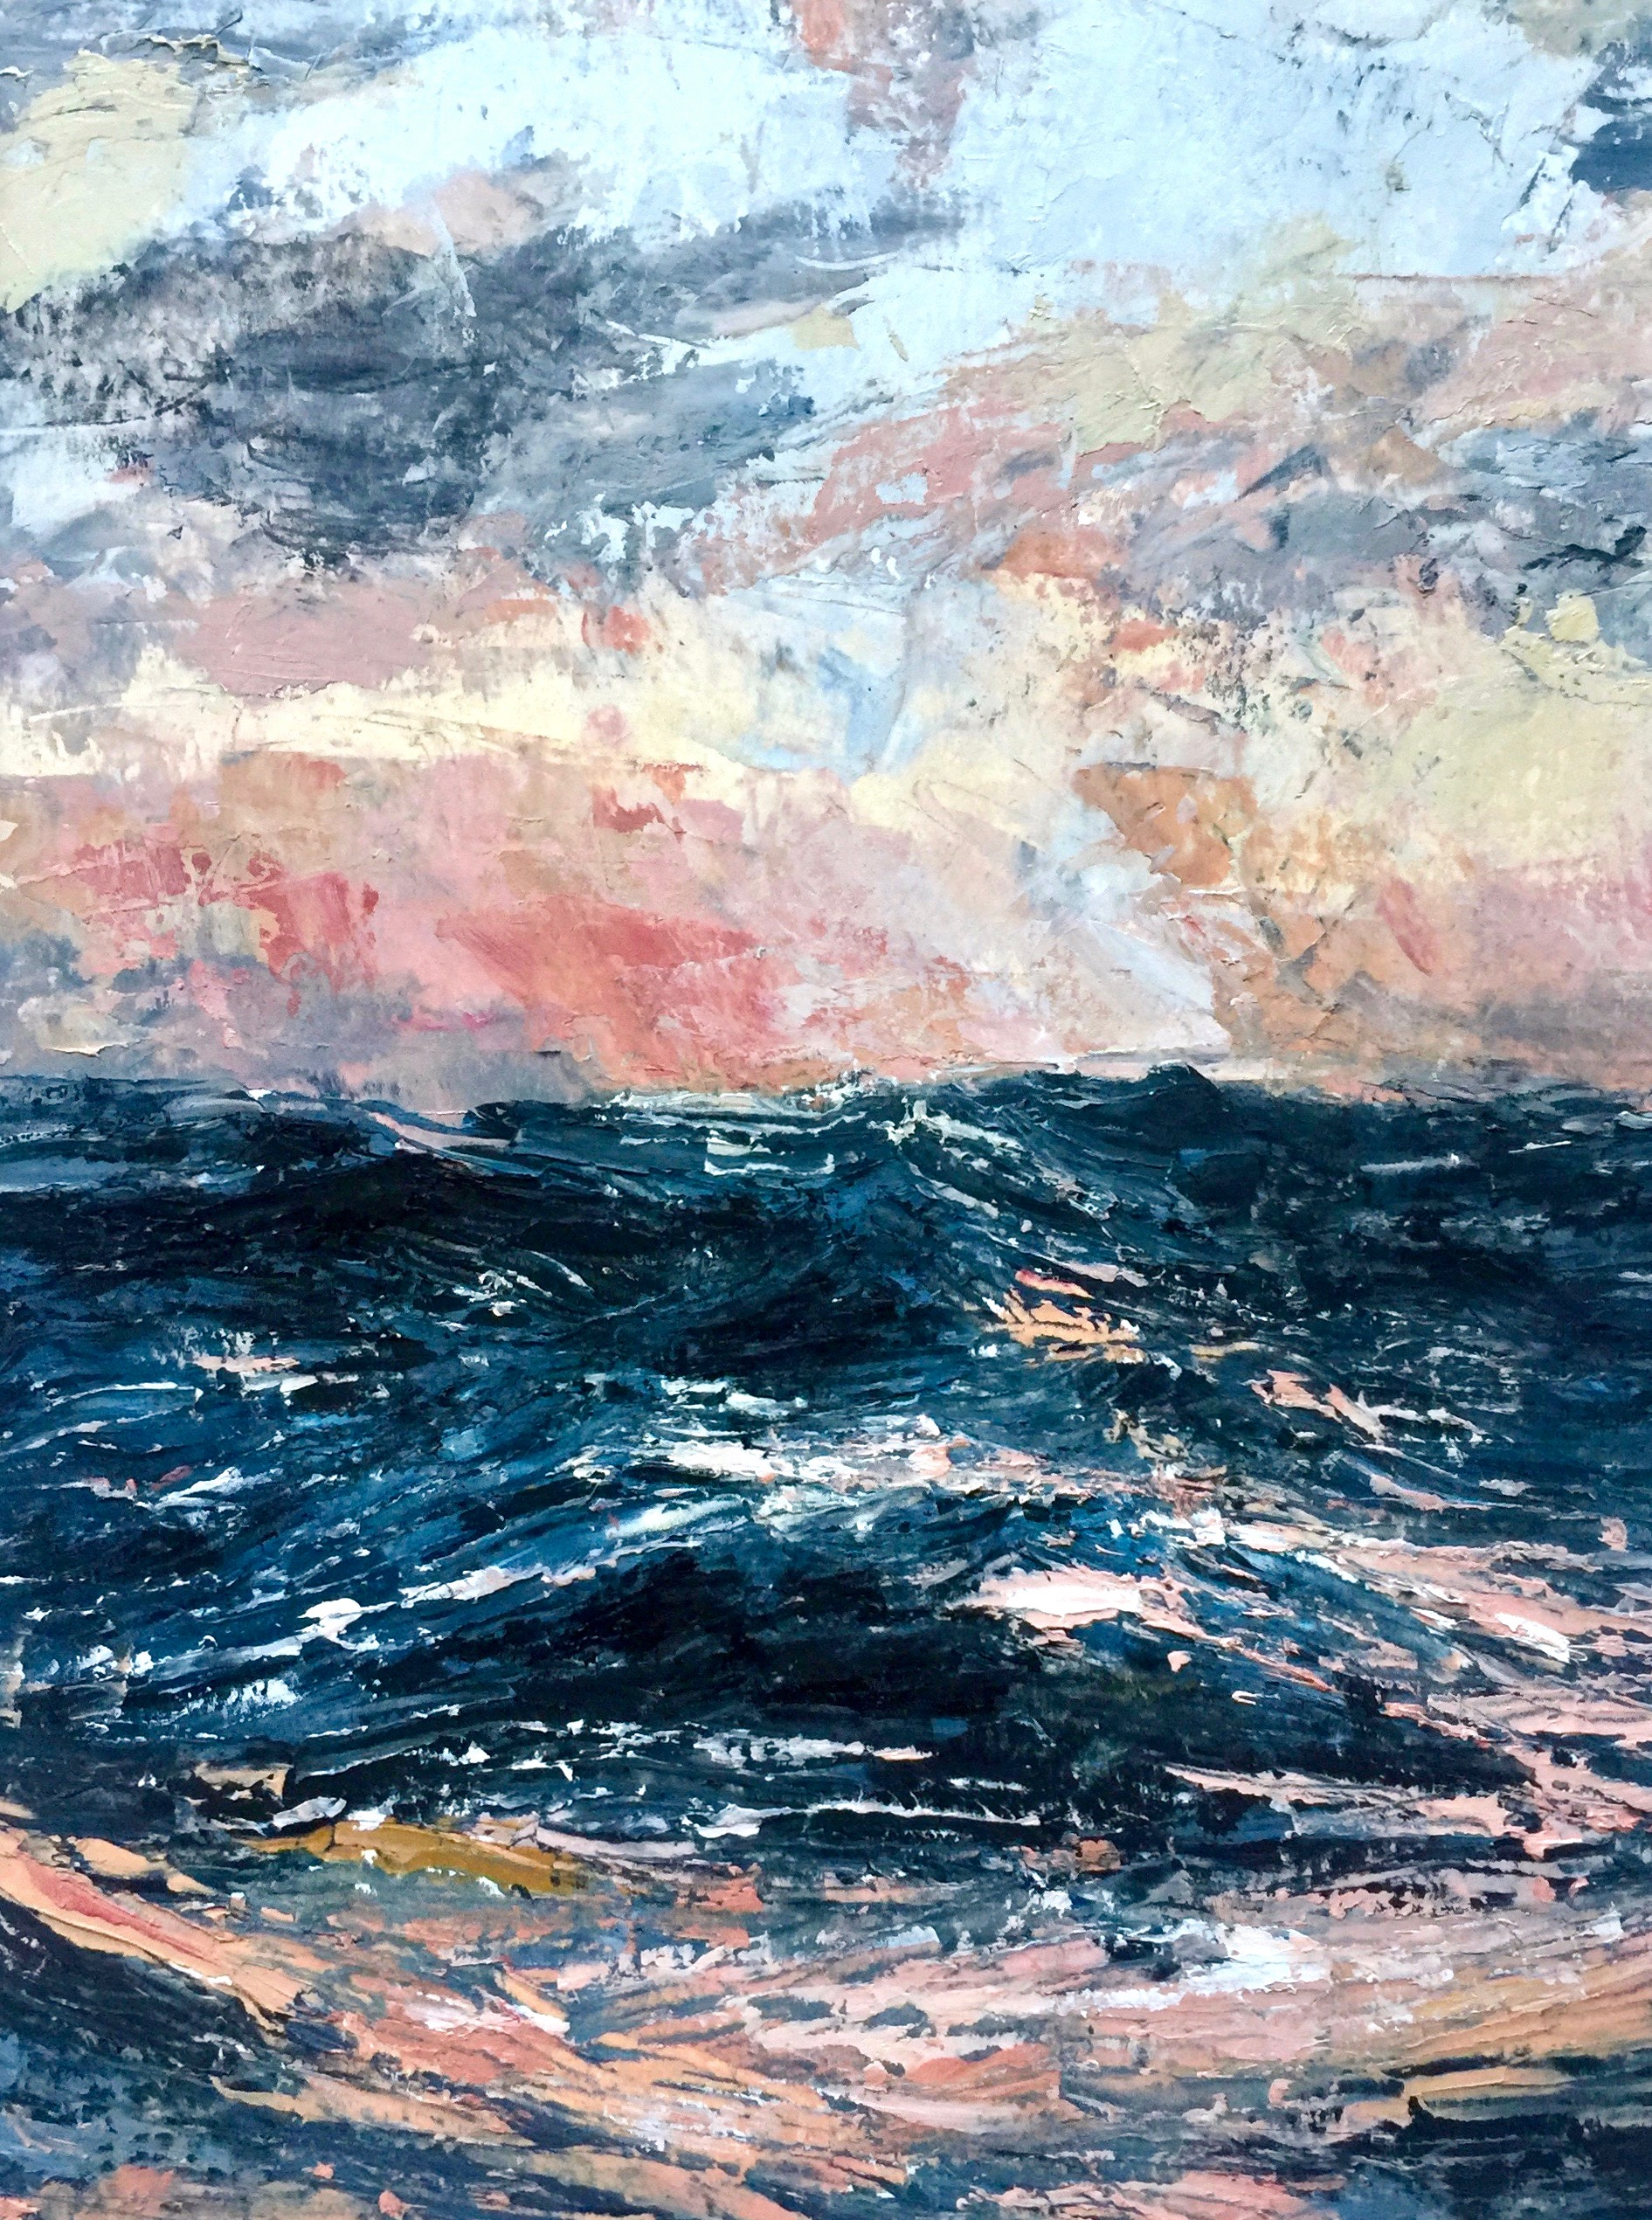 SunsetSea-SeaPower-8.5x12-TiffanyBlaise.jpg